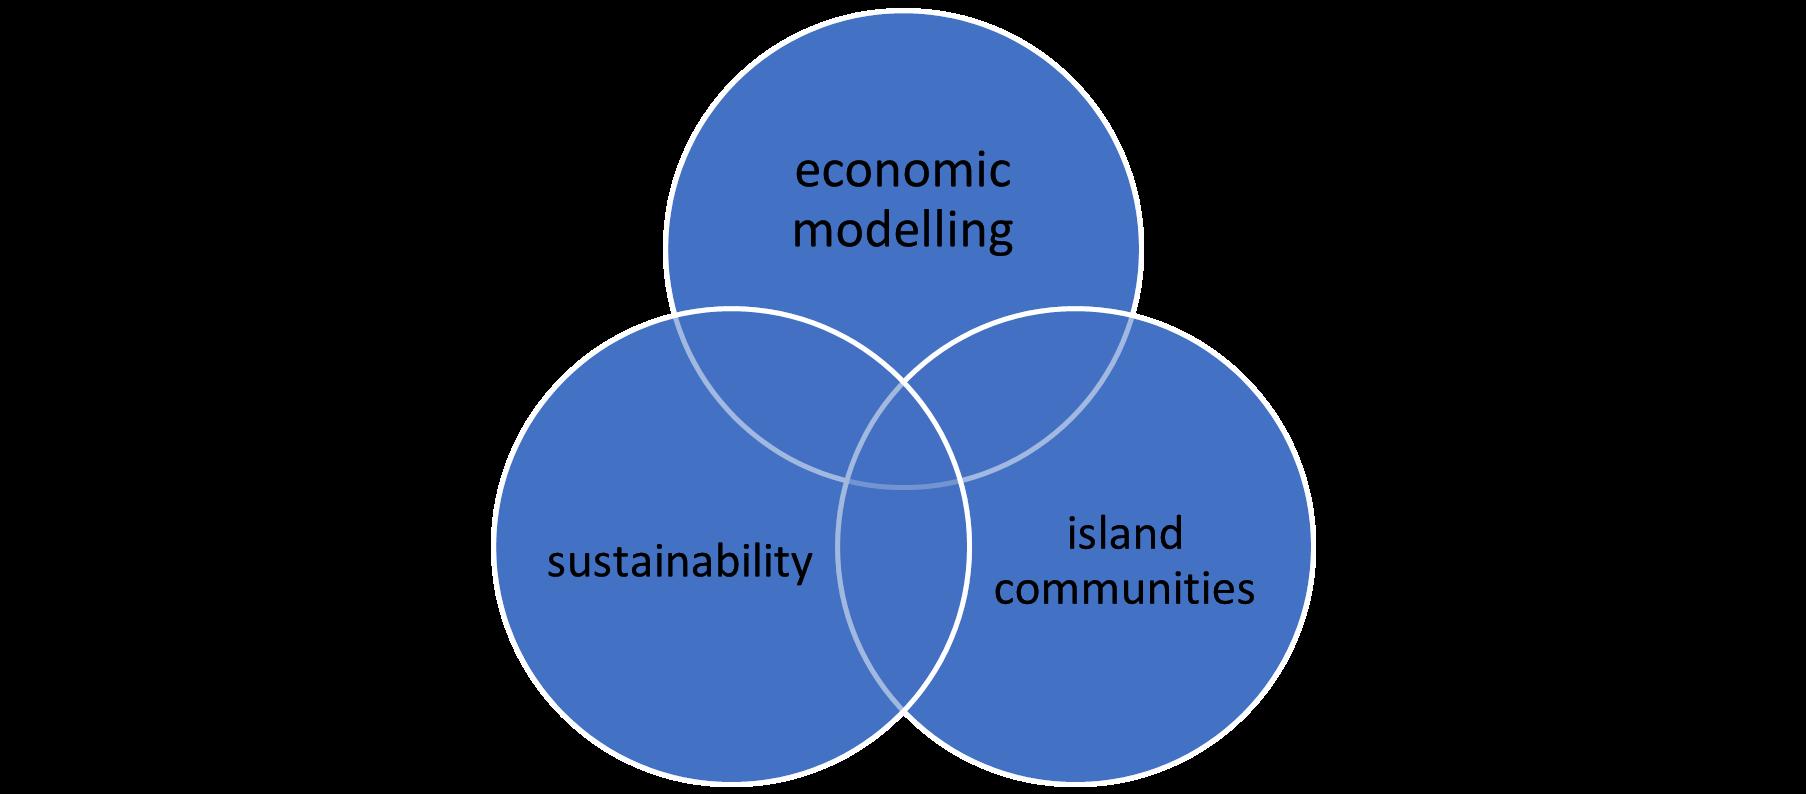 A Venn diagram linking economic modelling, sustainability, and island communities.